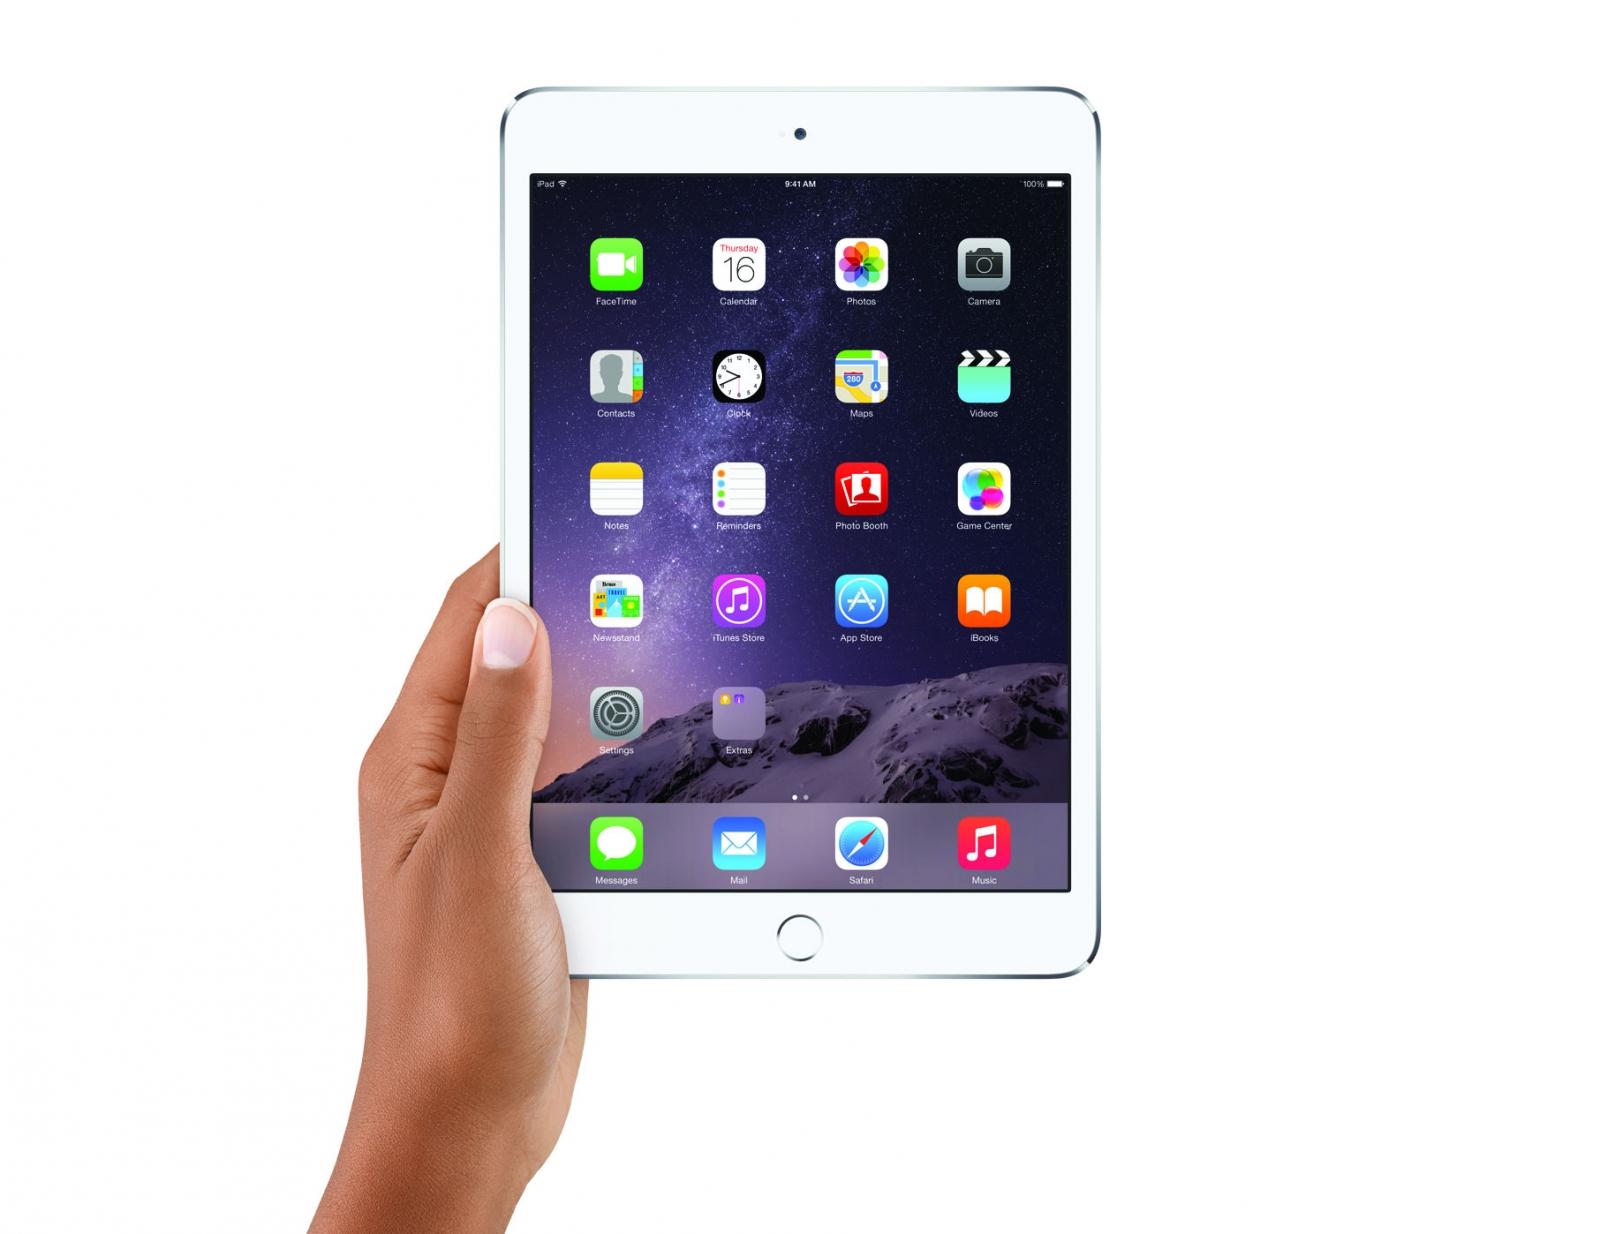 iPad mini 3 in hand